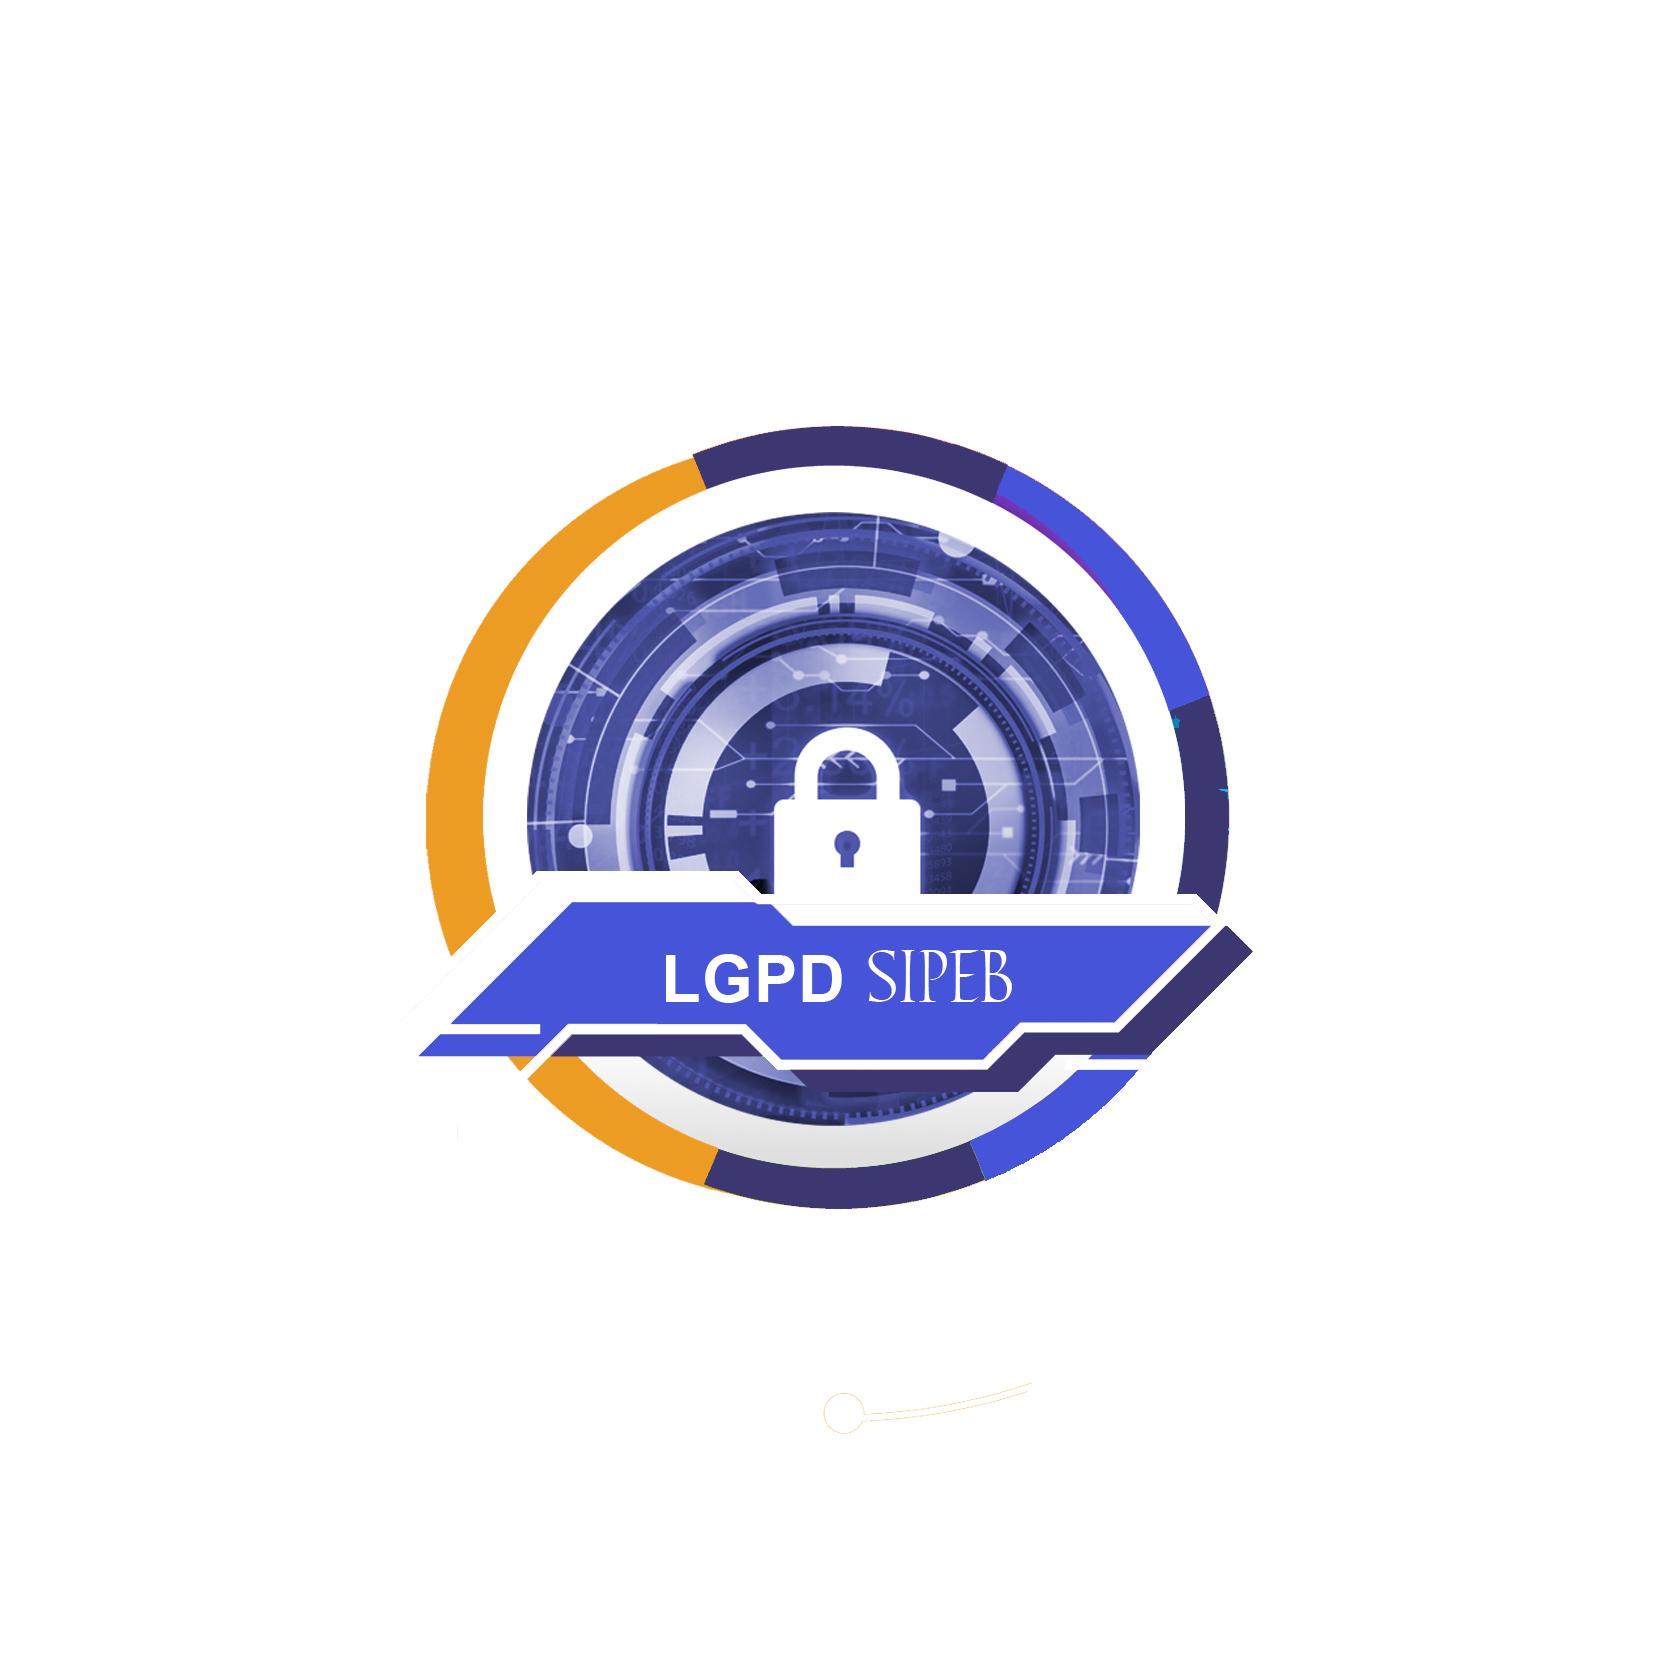 Logo LGPD - Sipeb